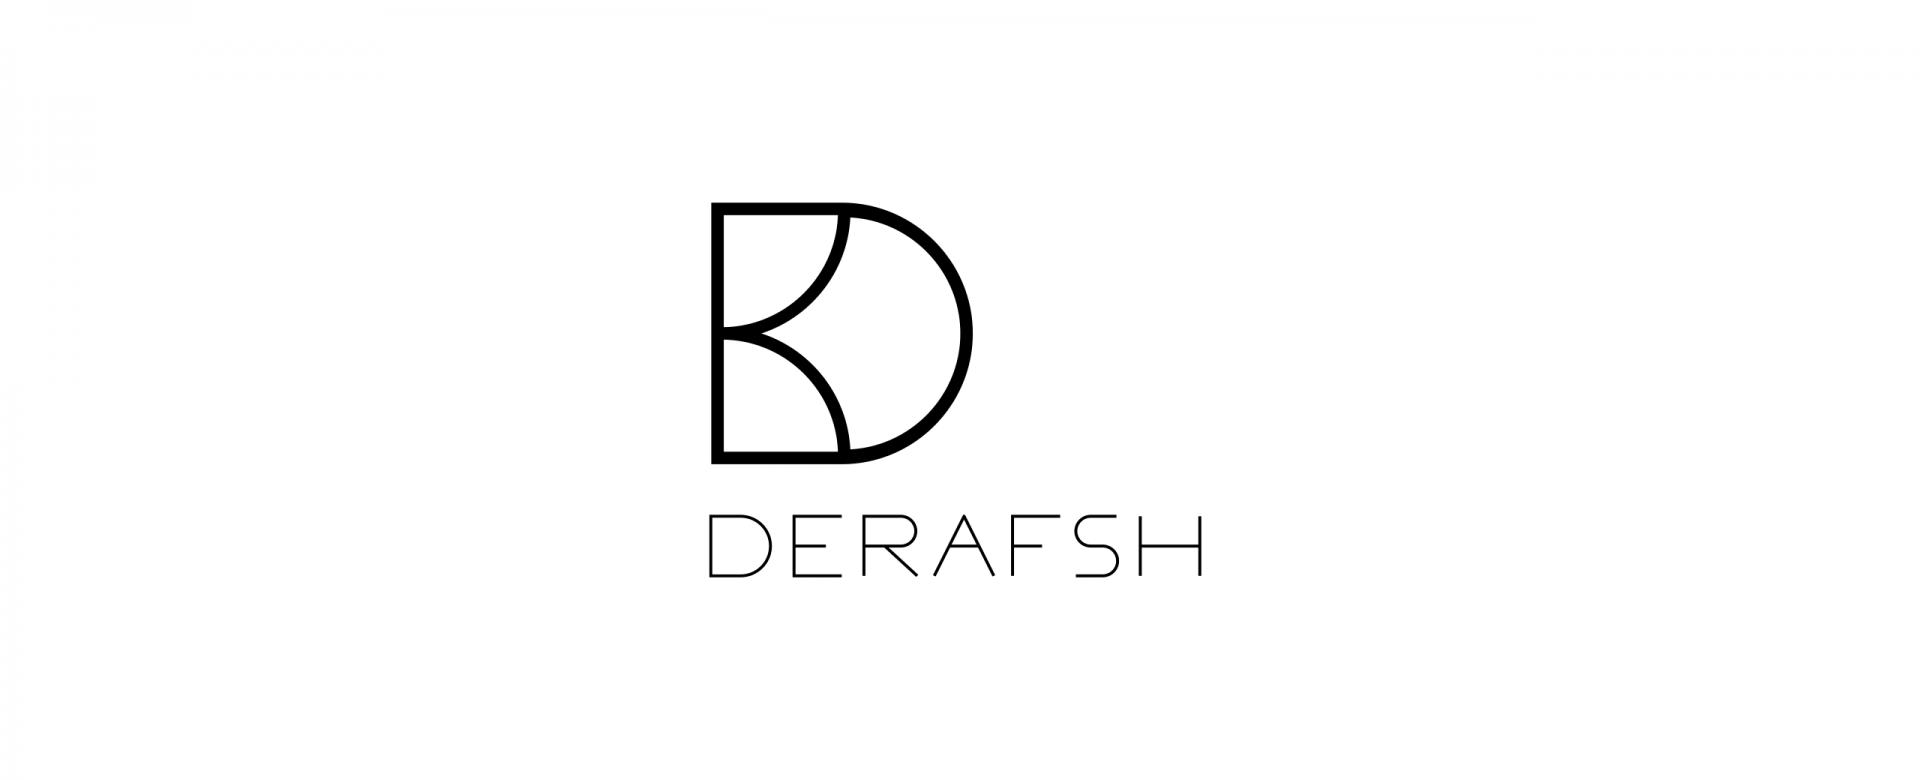 طراحی هویت بصری لوگو درفش derafsh logo design zen branding agency آژانس برندسازی ذن (1)-min